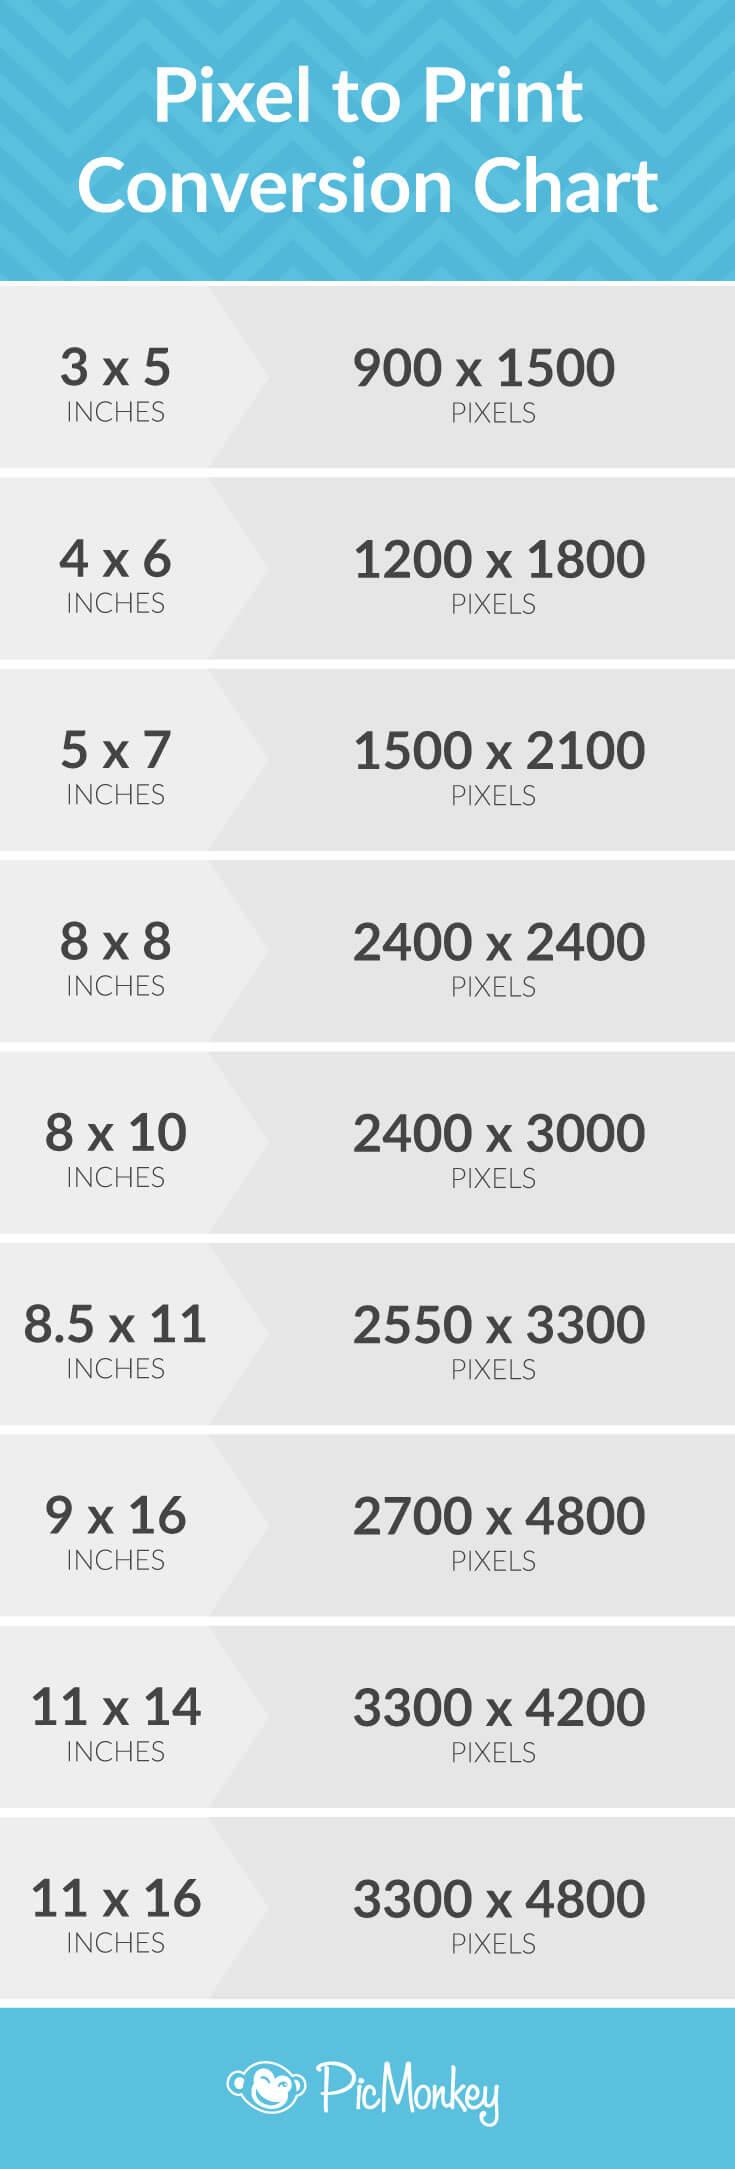 20 Diagrams That Make Print Design Much Easier Creative Market Blog Wiring Diagram Cheat Sheet 10 Standard Photo Sizes